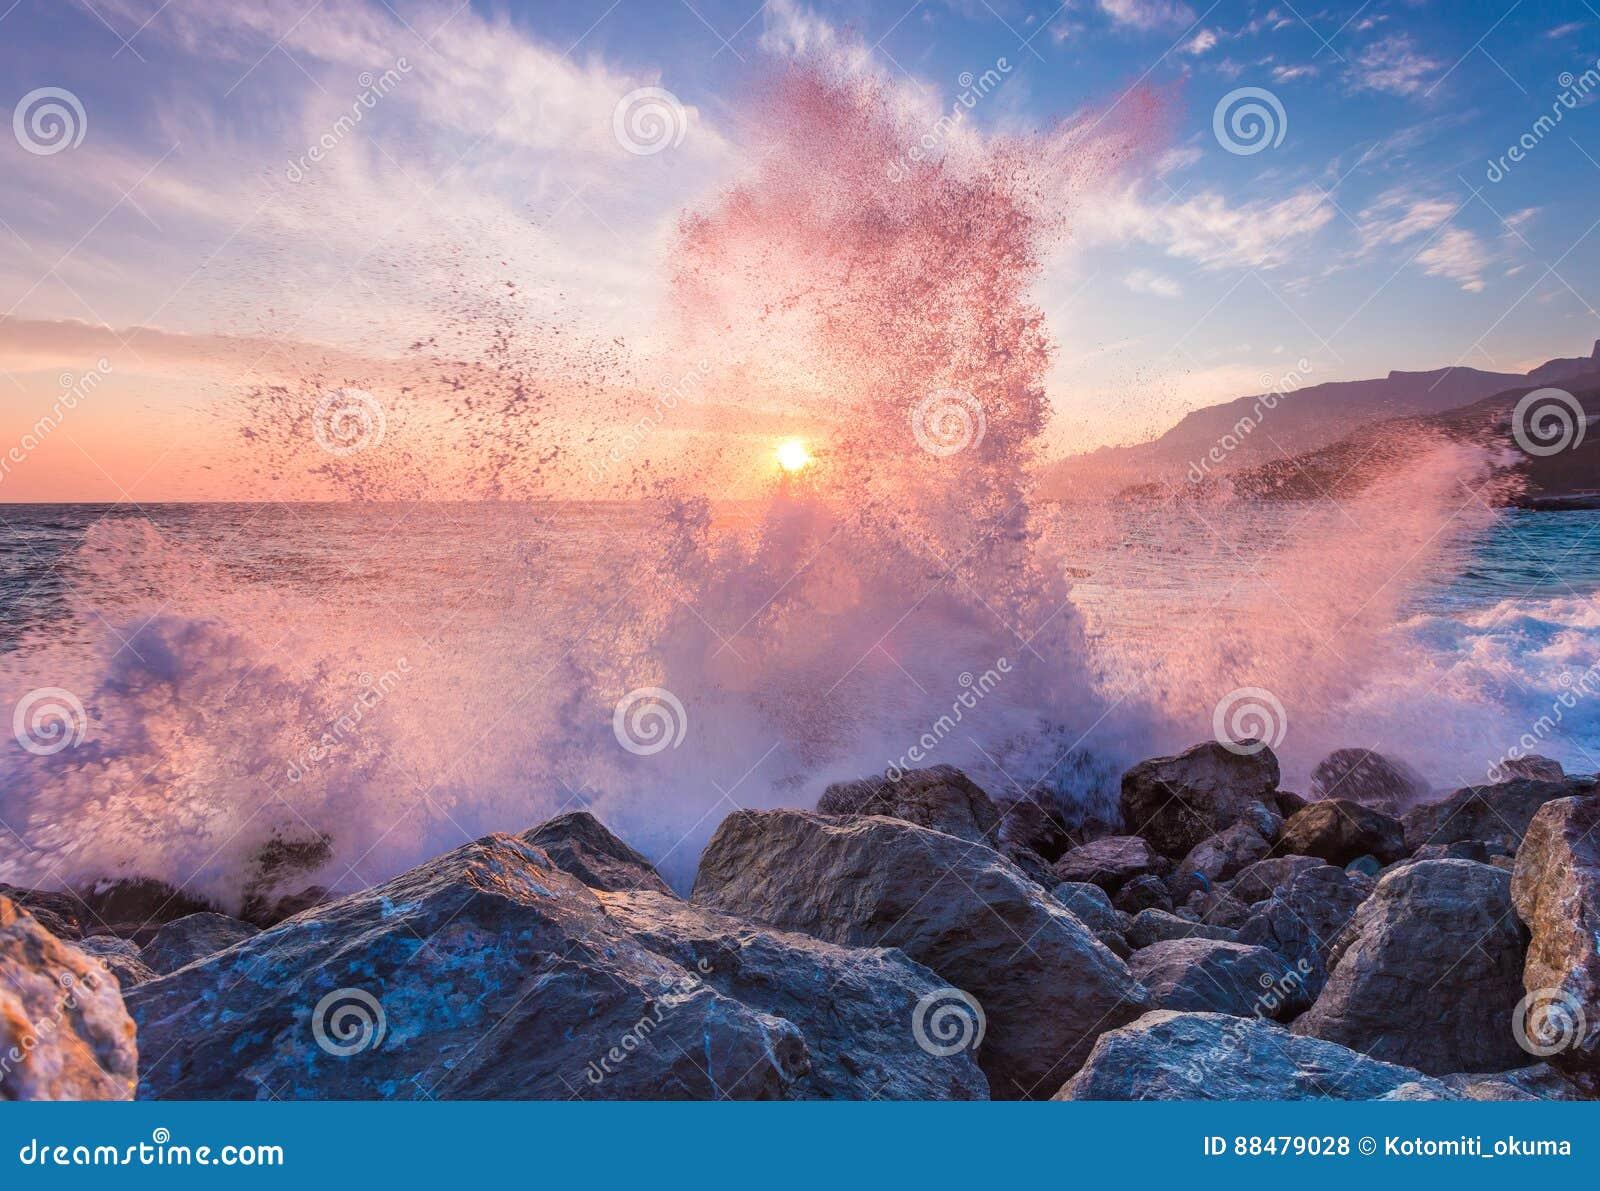 Big sea wave breaks against a stone